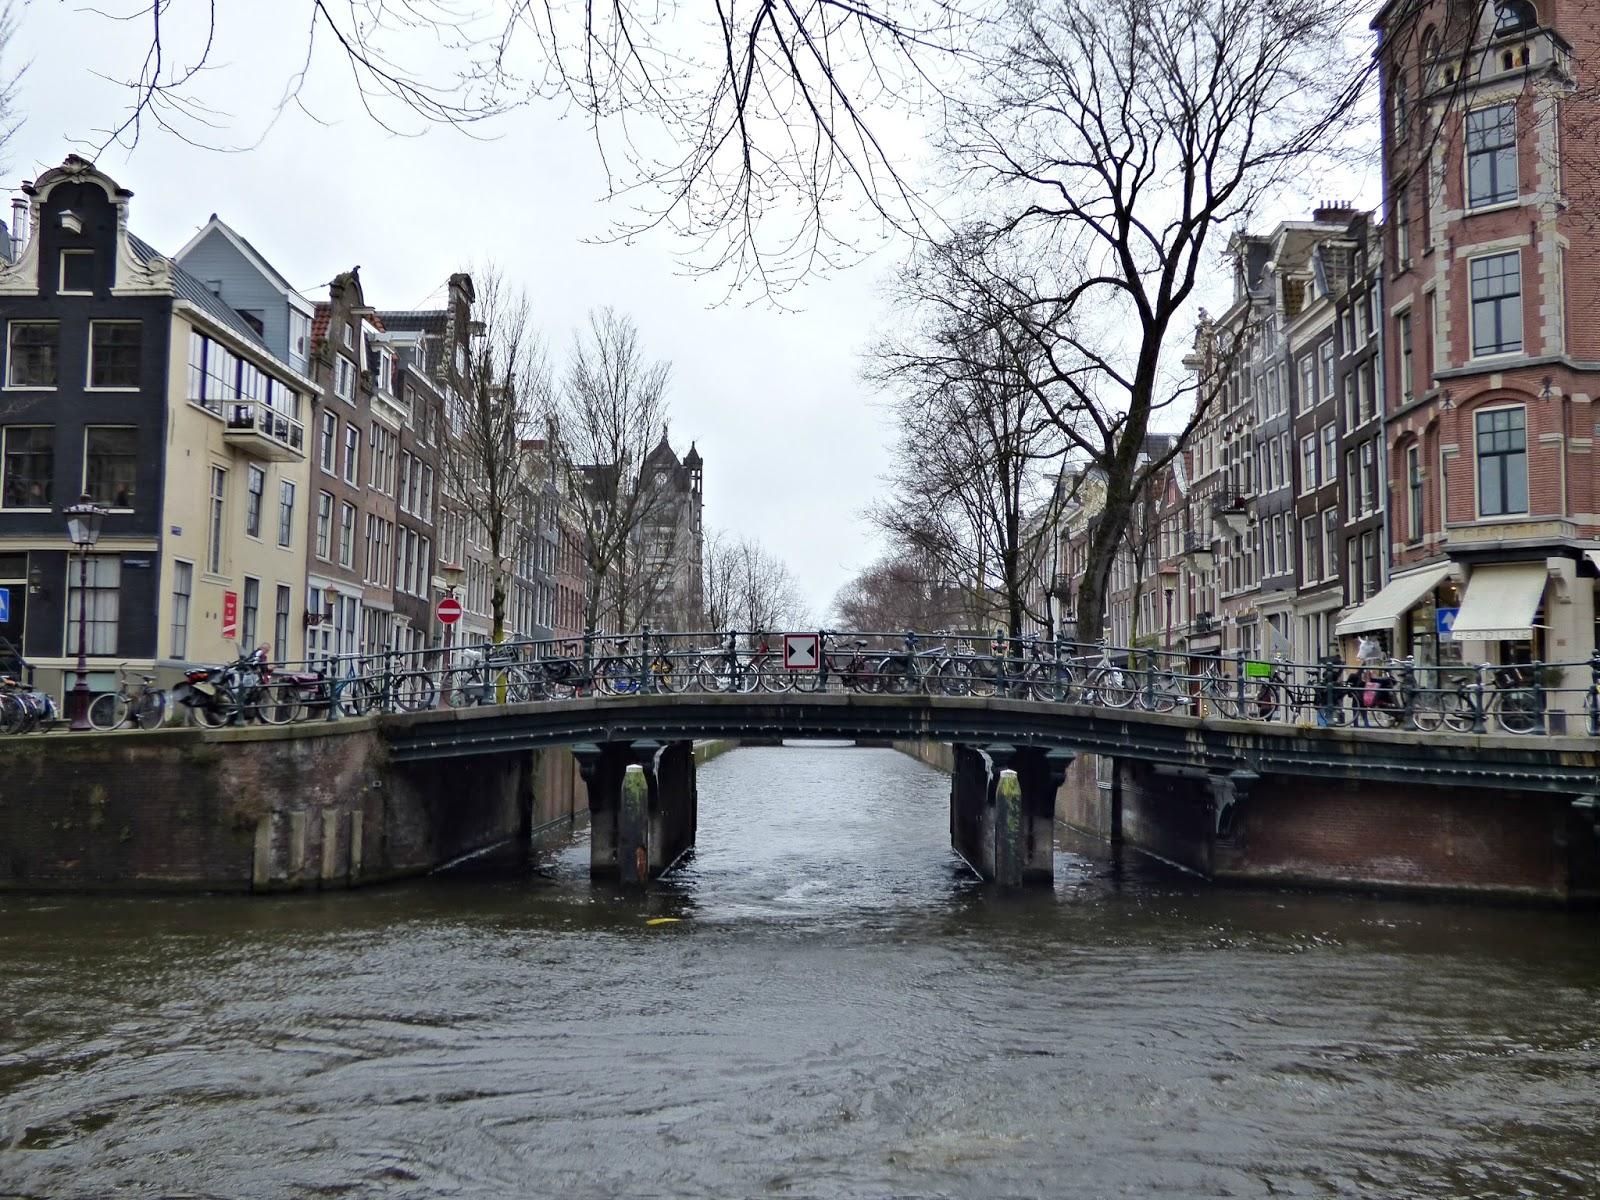 Amsterdam mini cruise experience